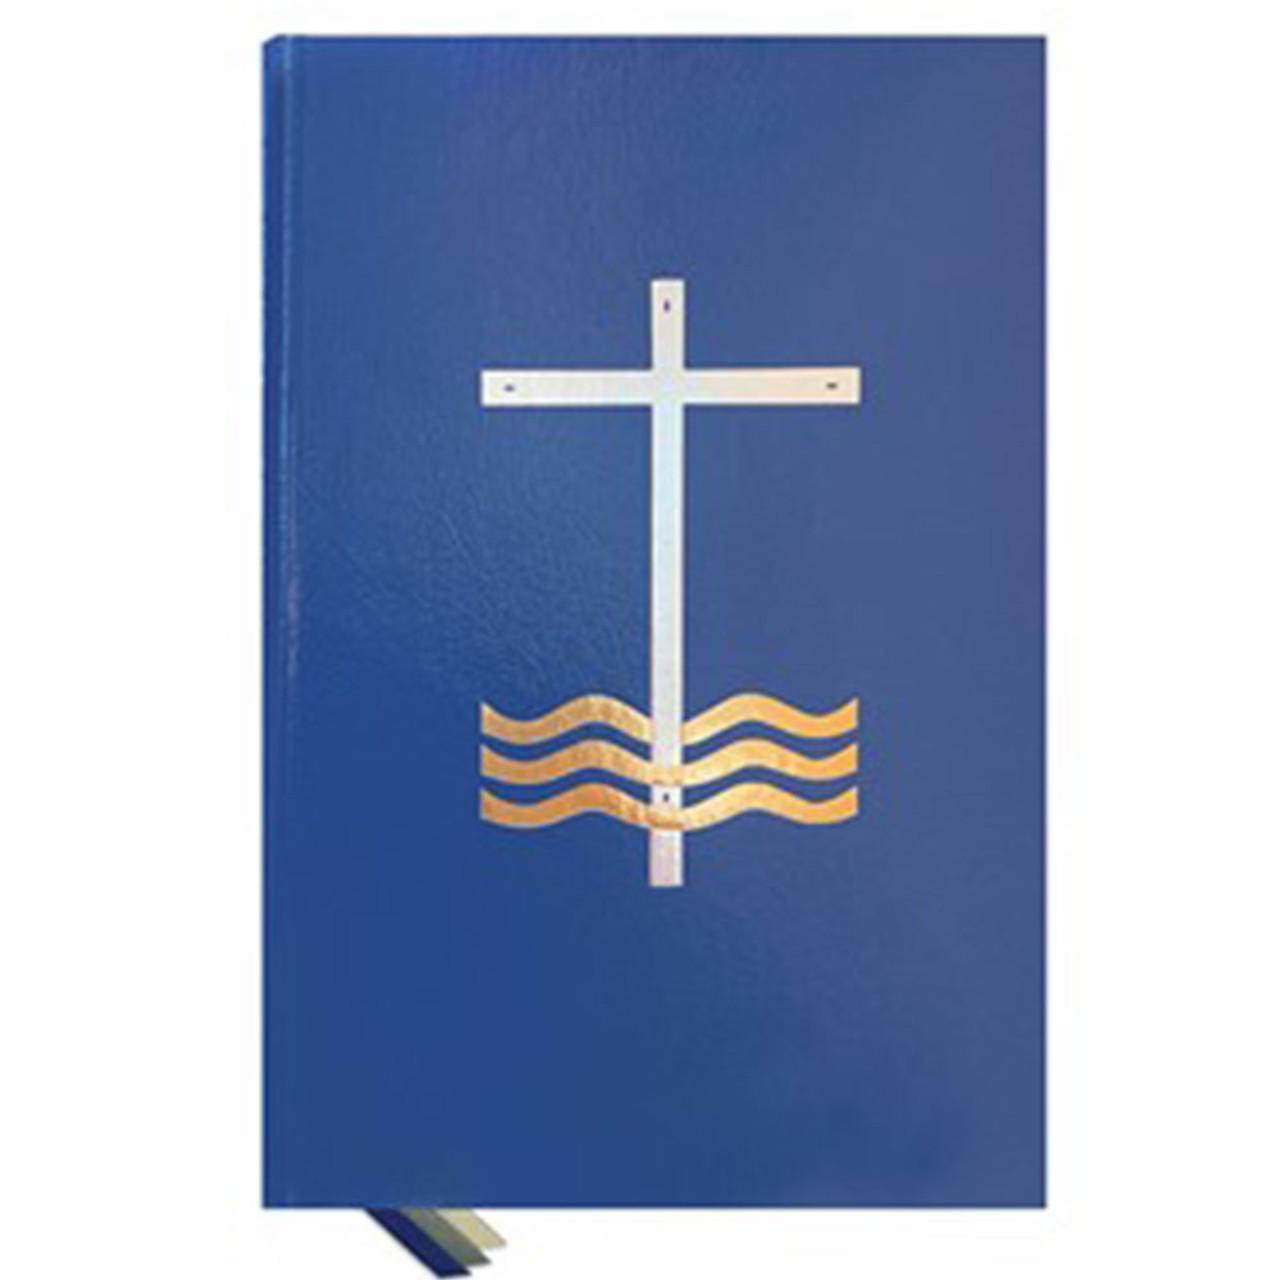 Order of Baptism Bilingual Participant Edition